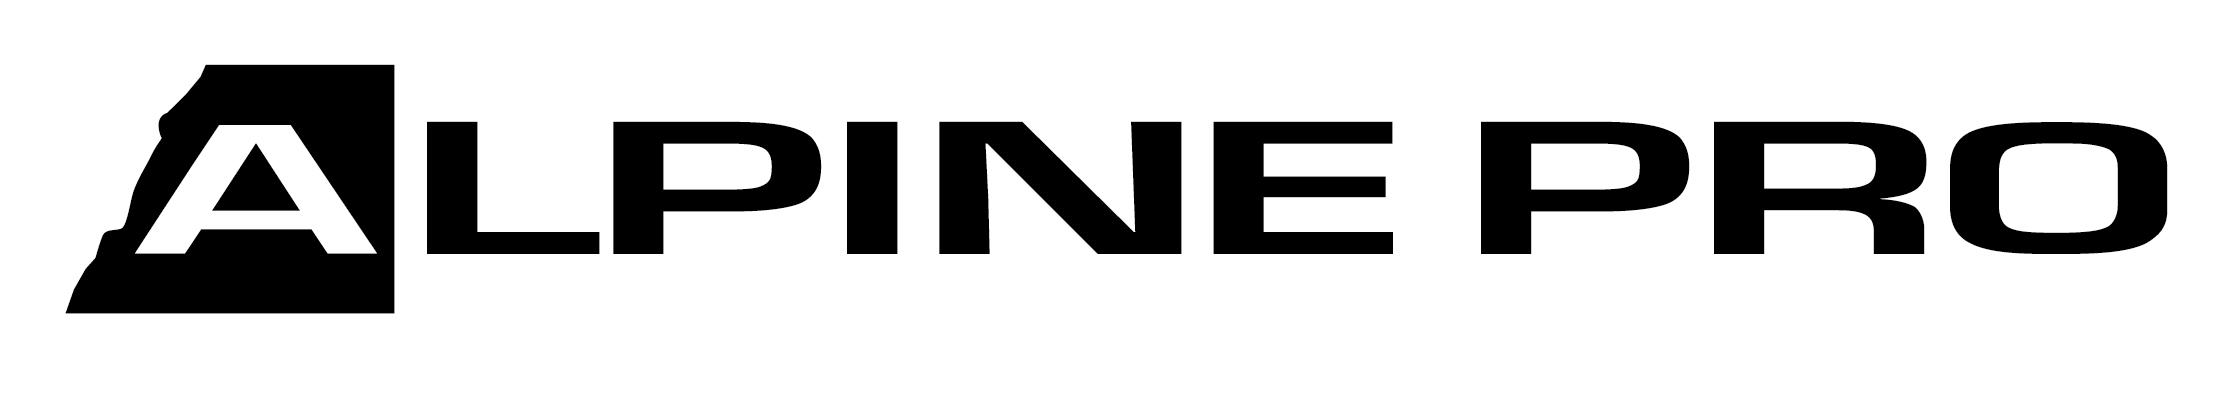 logo alpine pro